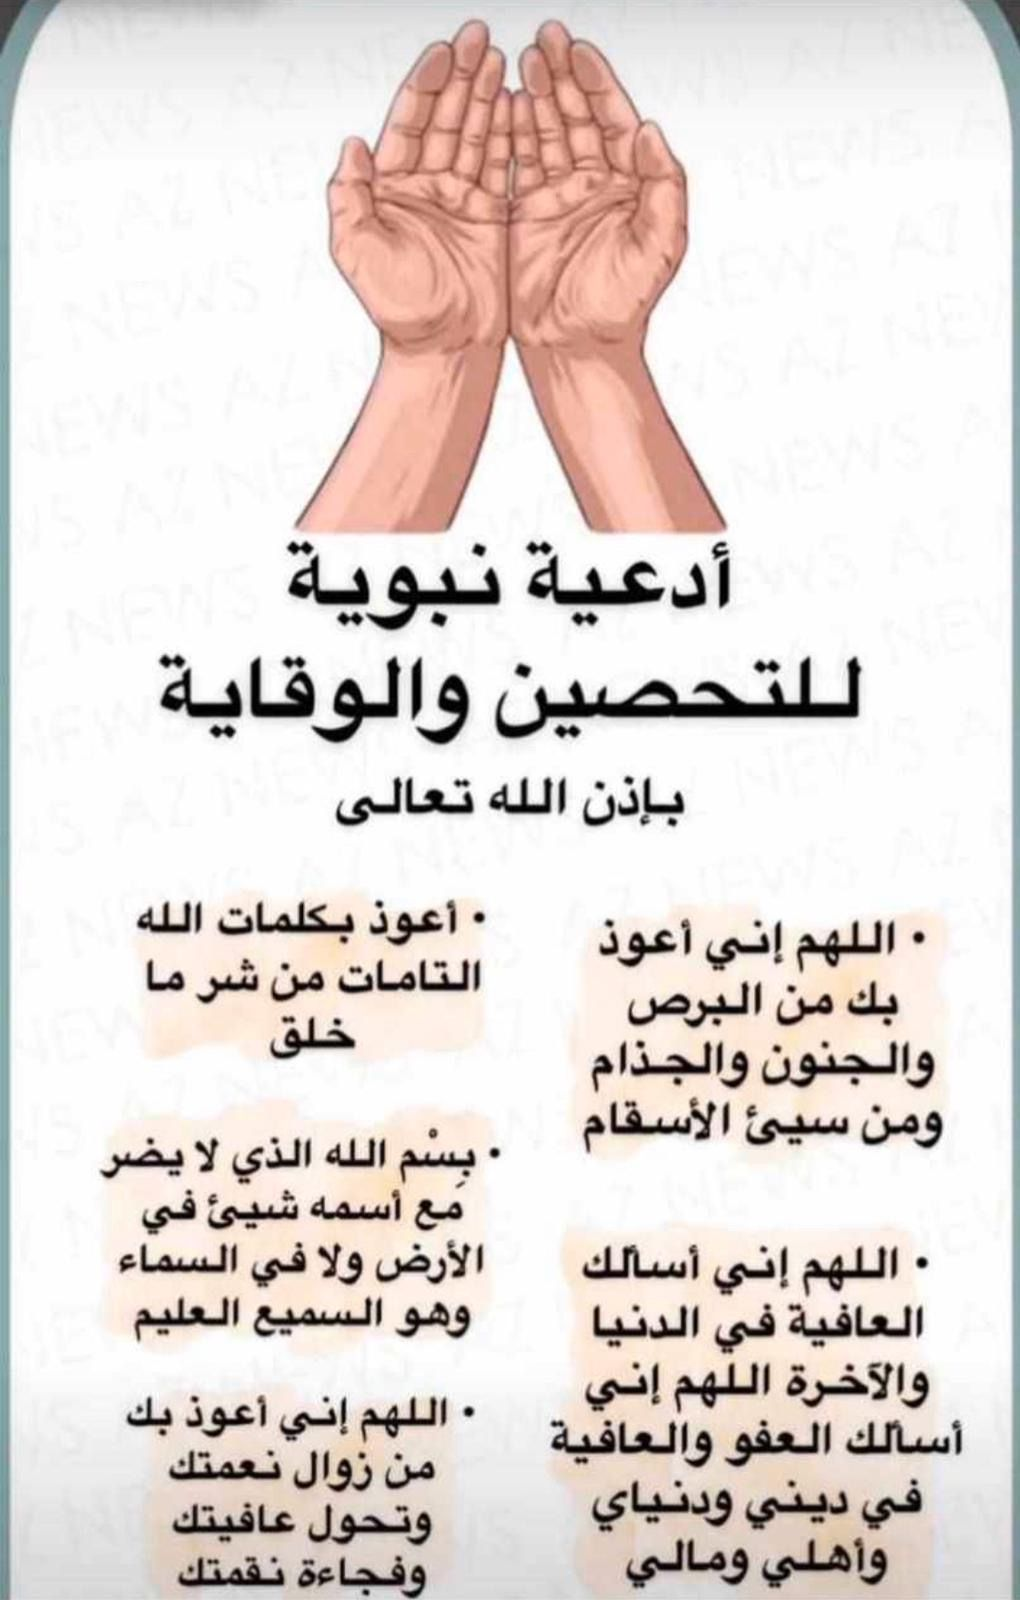 Pin By Soha Faroja On دعاء Islam Facts Islamic Quotes Wallpaper Islamic Phrases